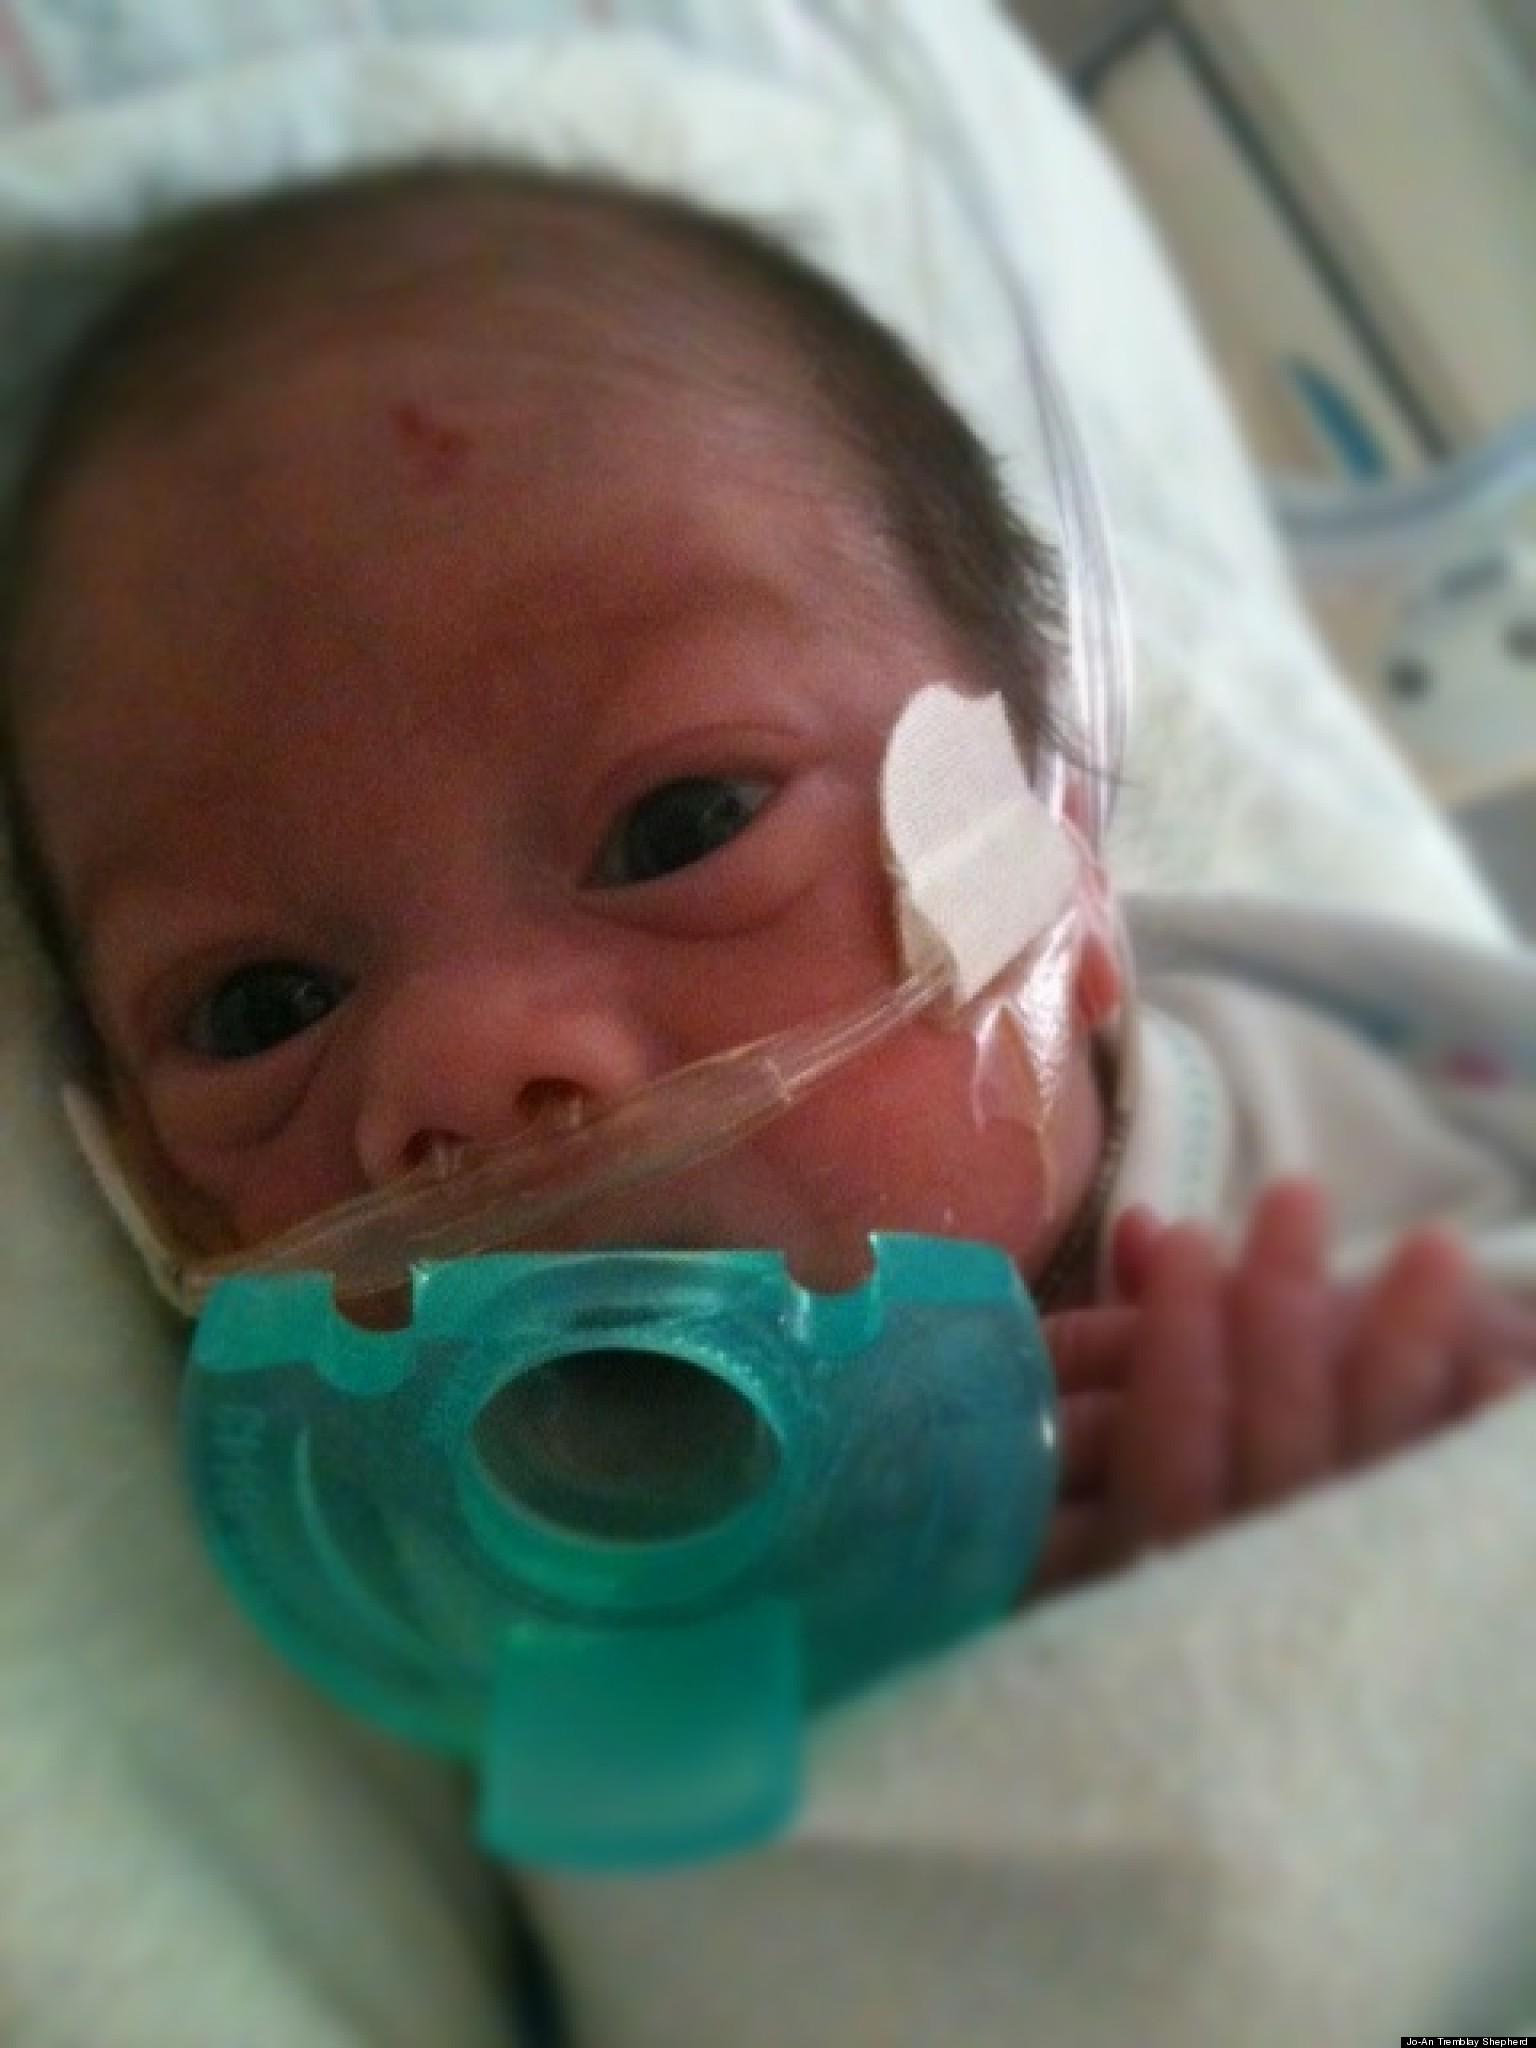 Mom Of Premature Baby Evacuated From NYU During Hurricane